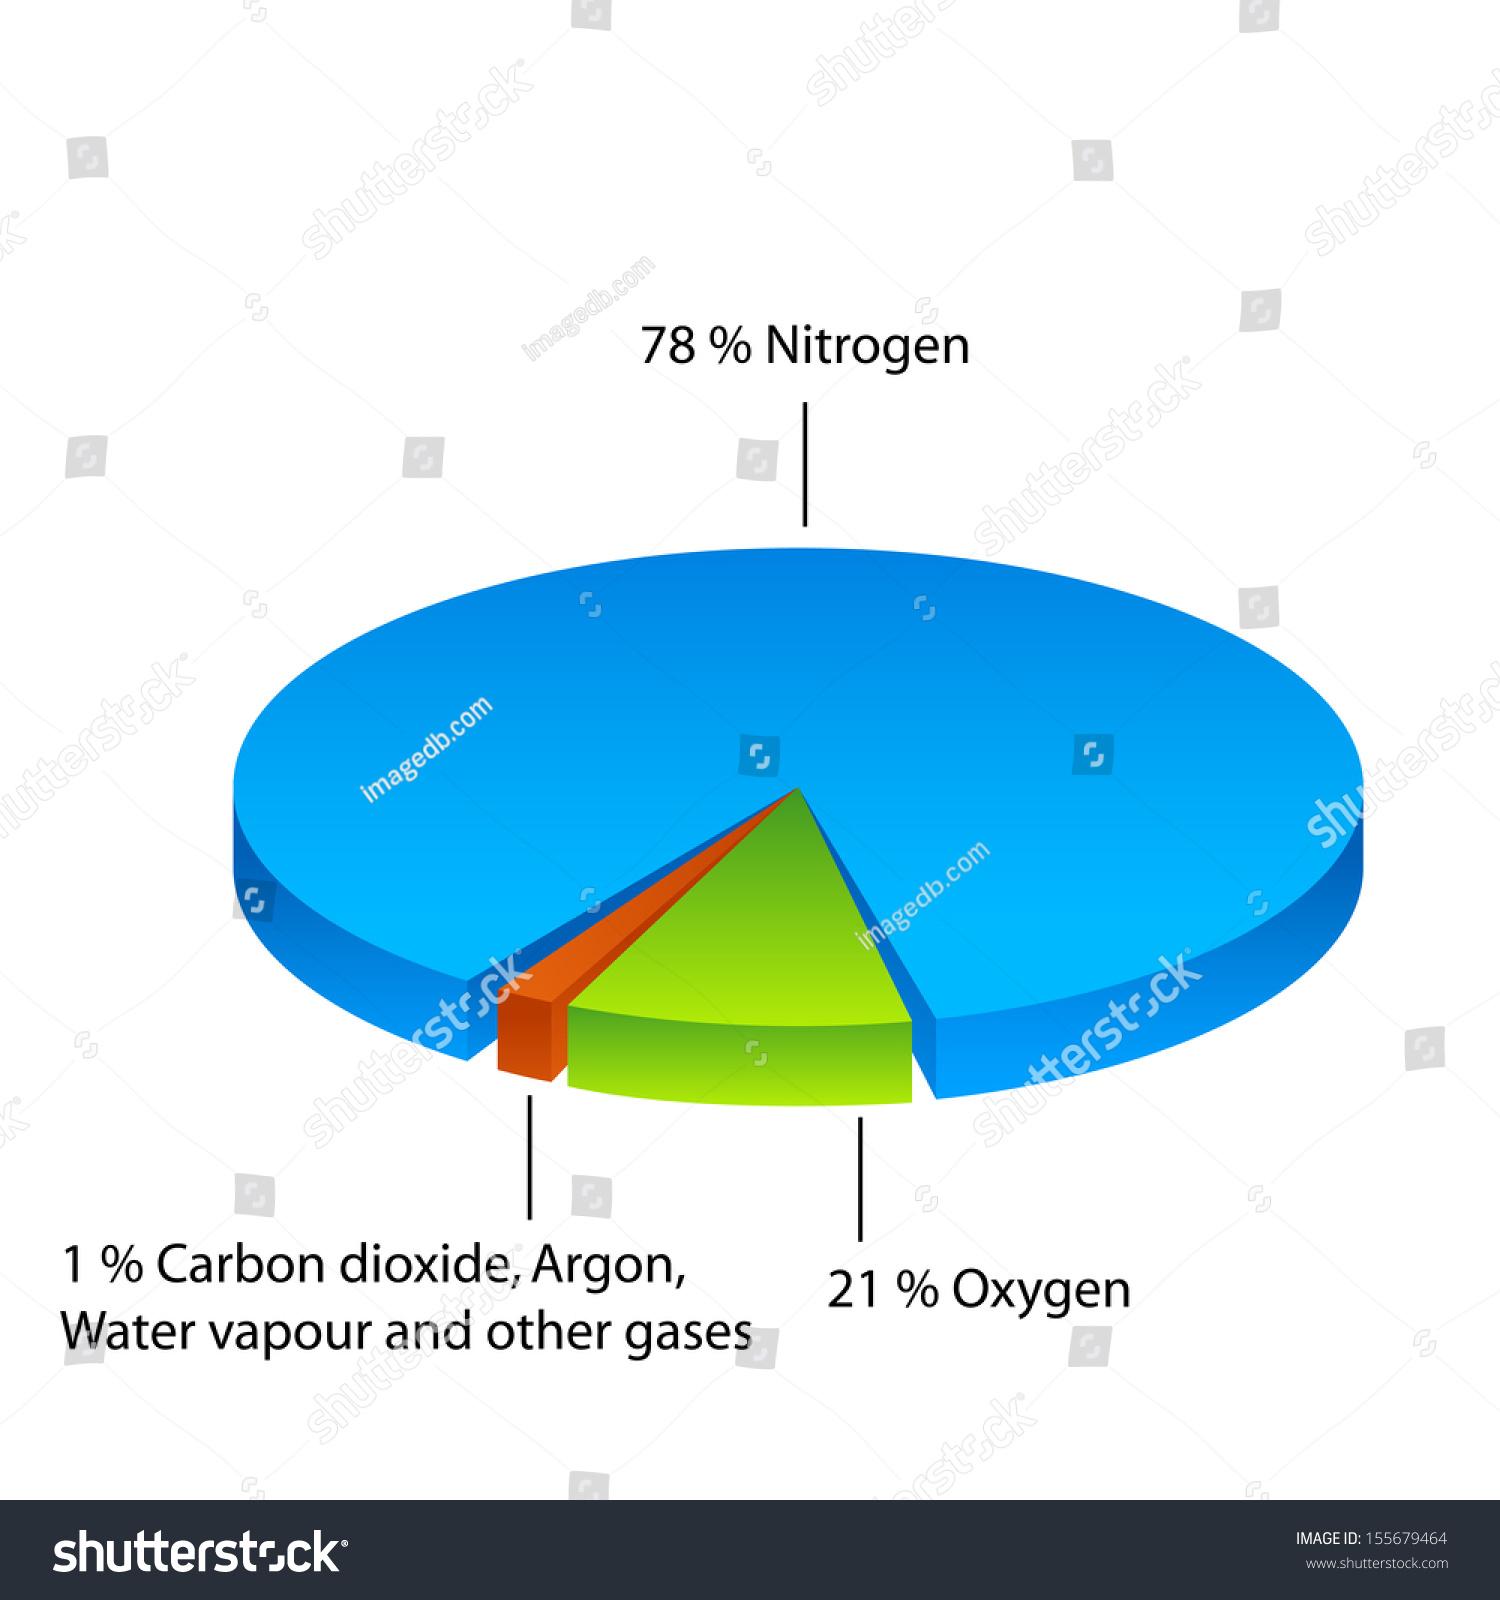 Air Composition Pie Chart Stock Illustration 155679464 Shutterstock